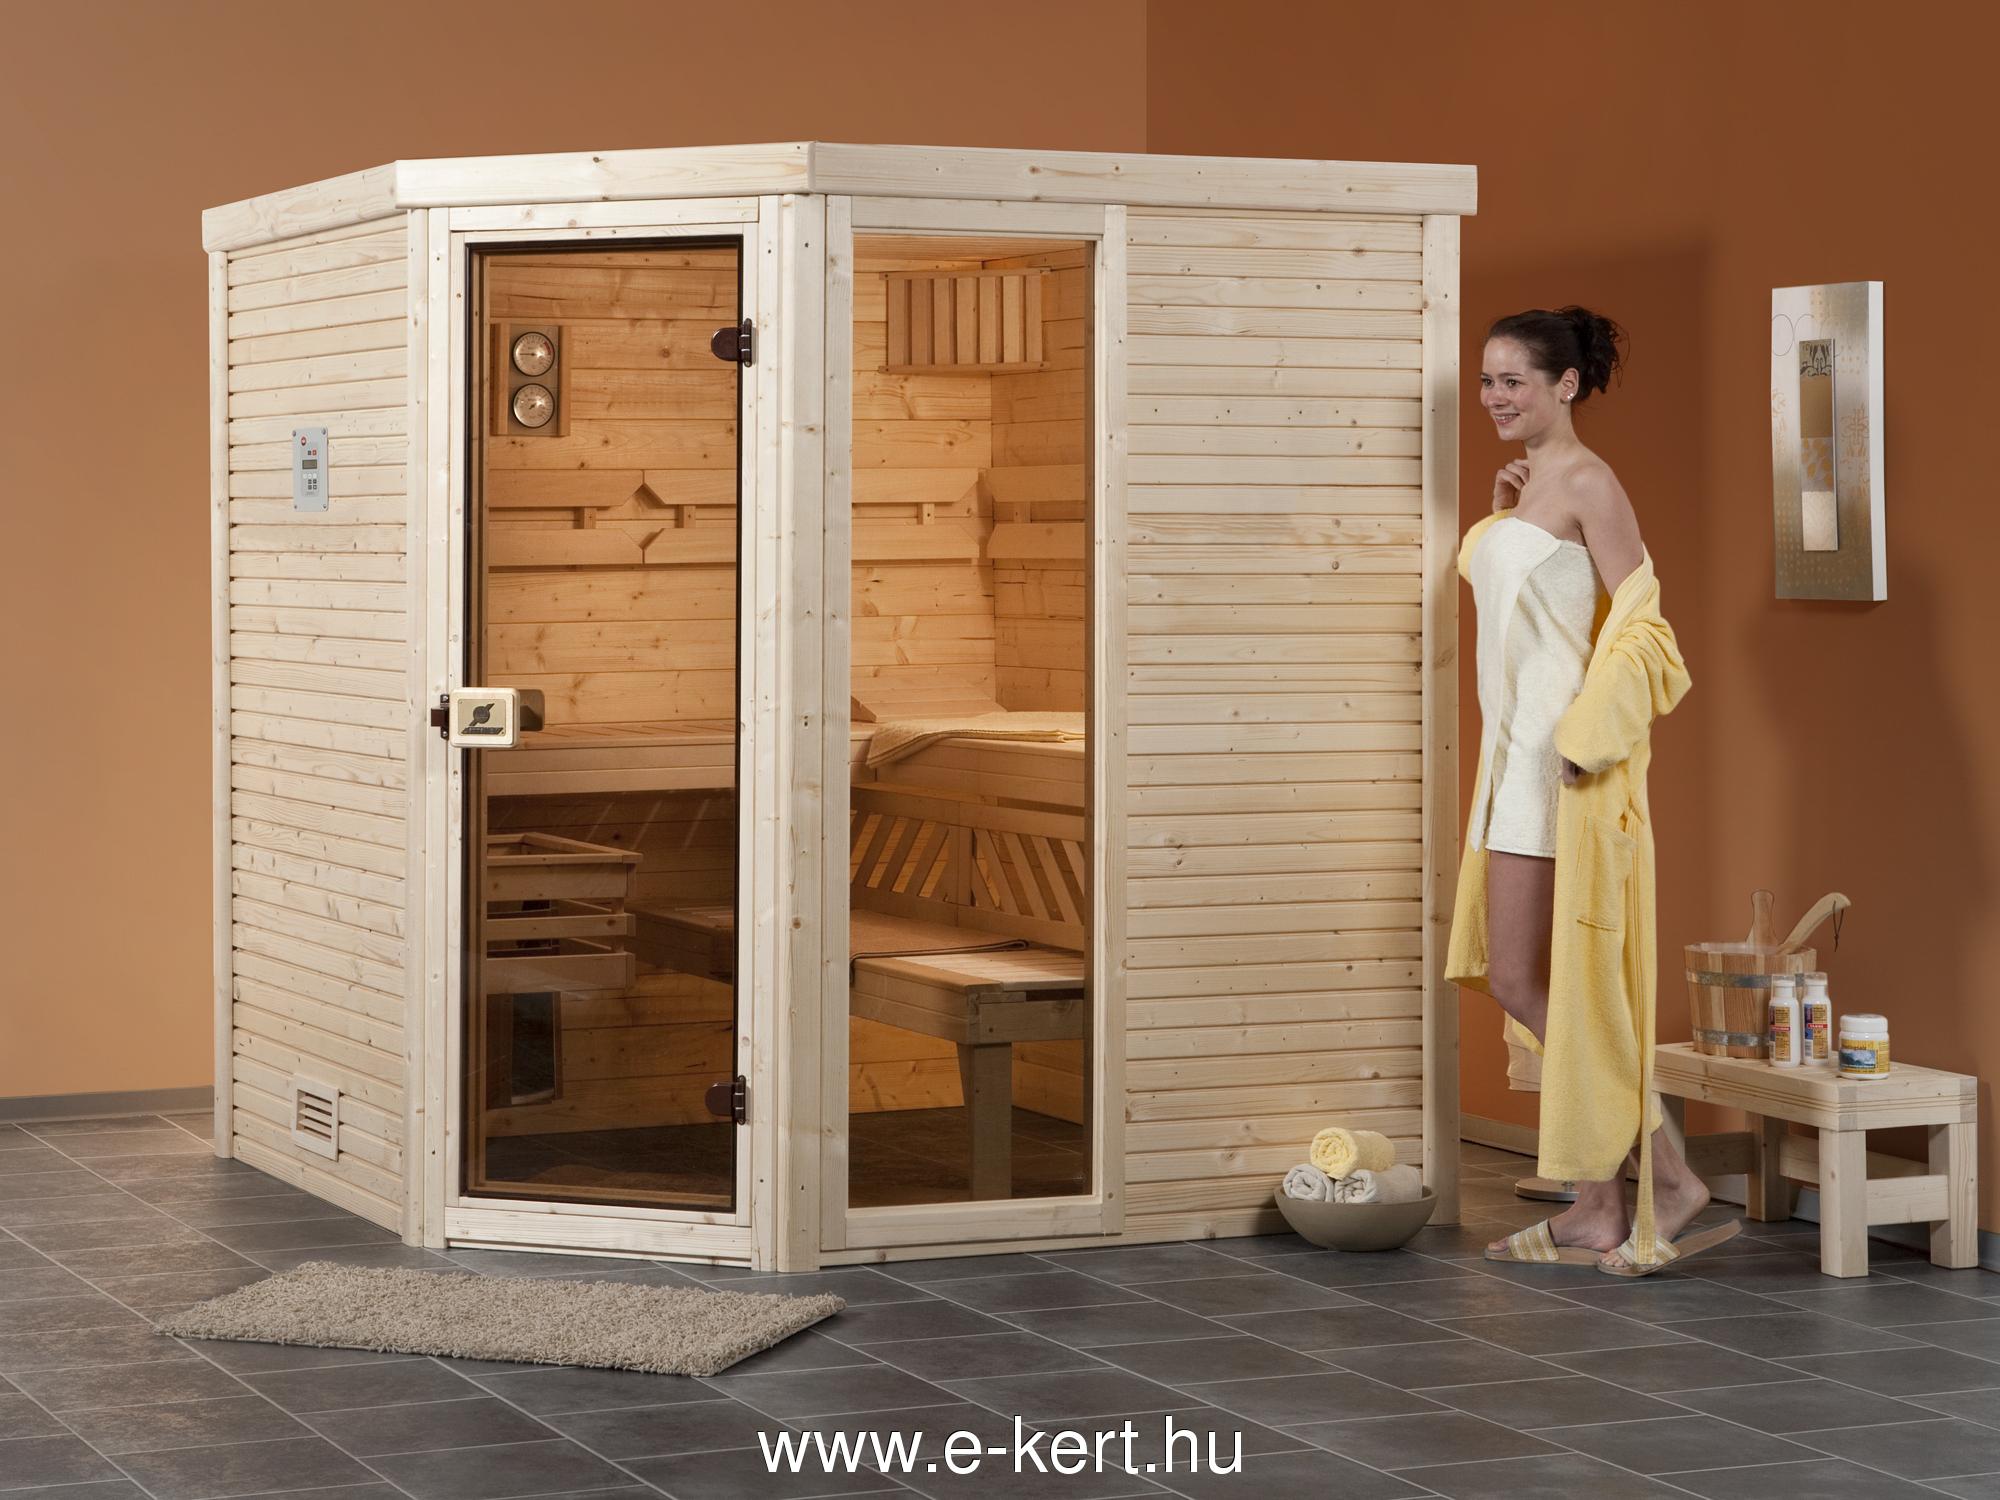 Cubilis finn szauna kabin 195×195 cm